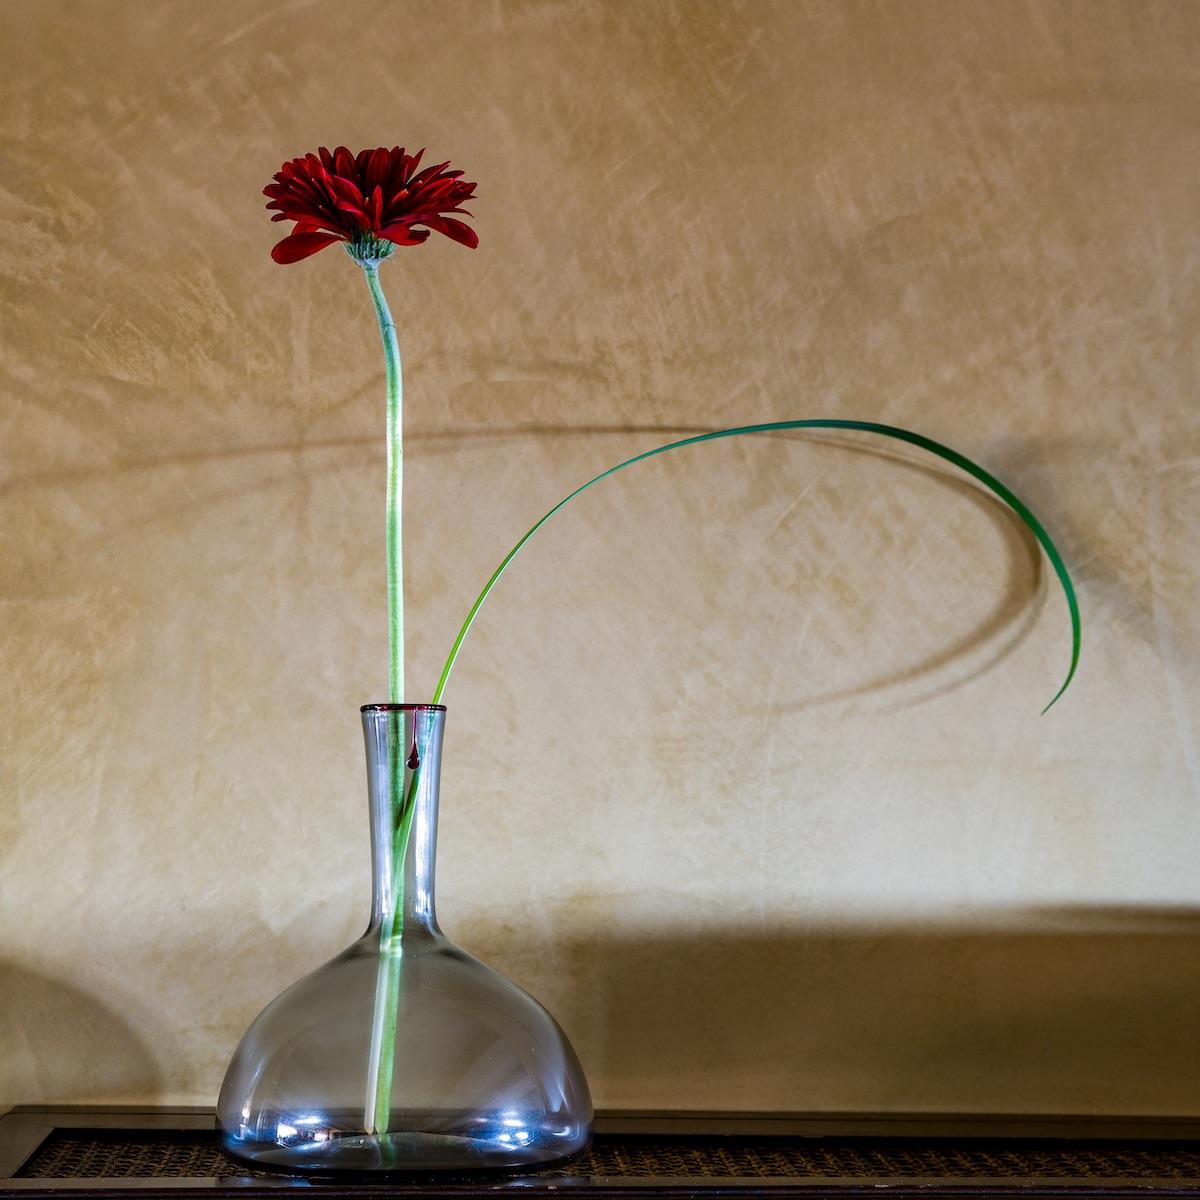 lacrima-jug-pitcher-glass-elegant-classic-murano-designer-handmade